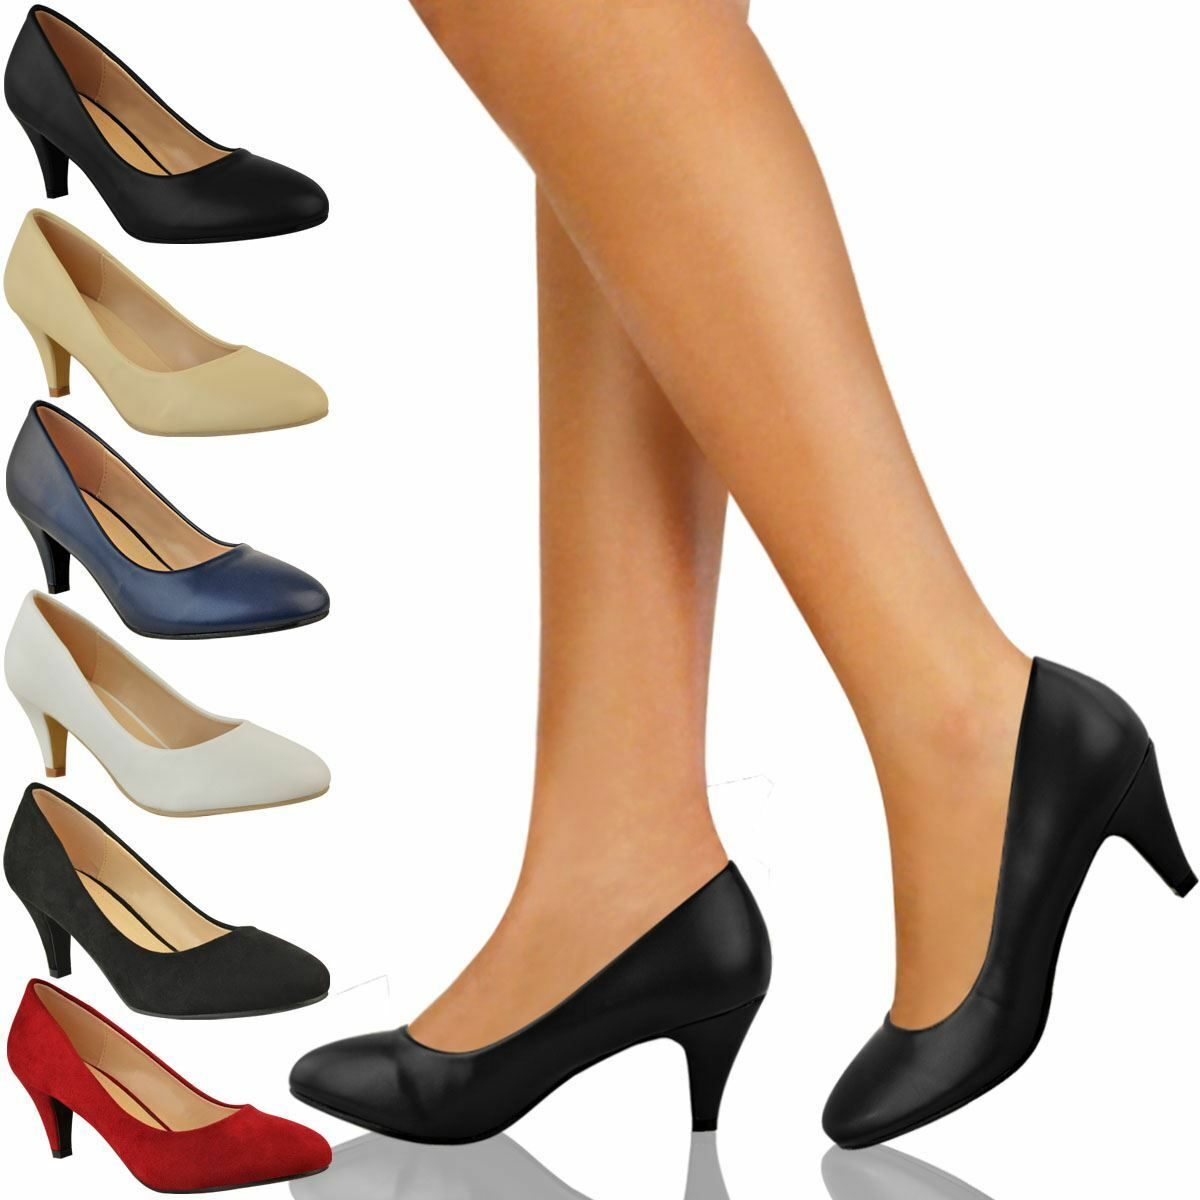 Moda jest prosta i niedroga Womens Ladies Low Heel Court Shoes Comfort Work Office Formal Wedding Size New